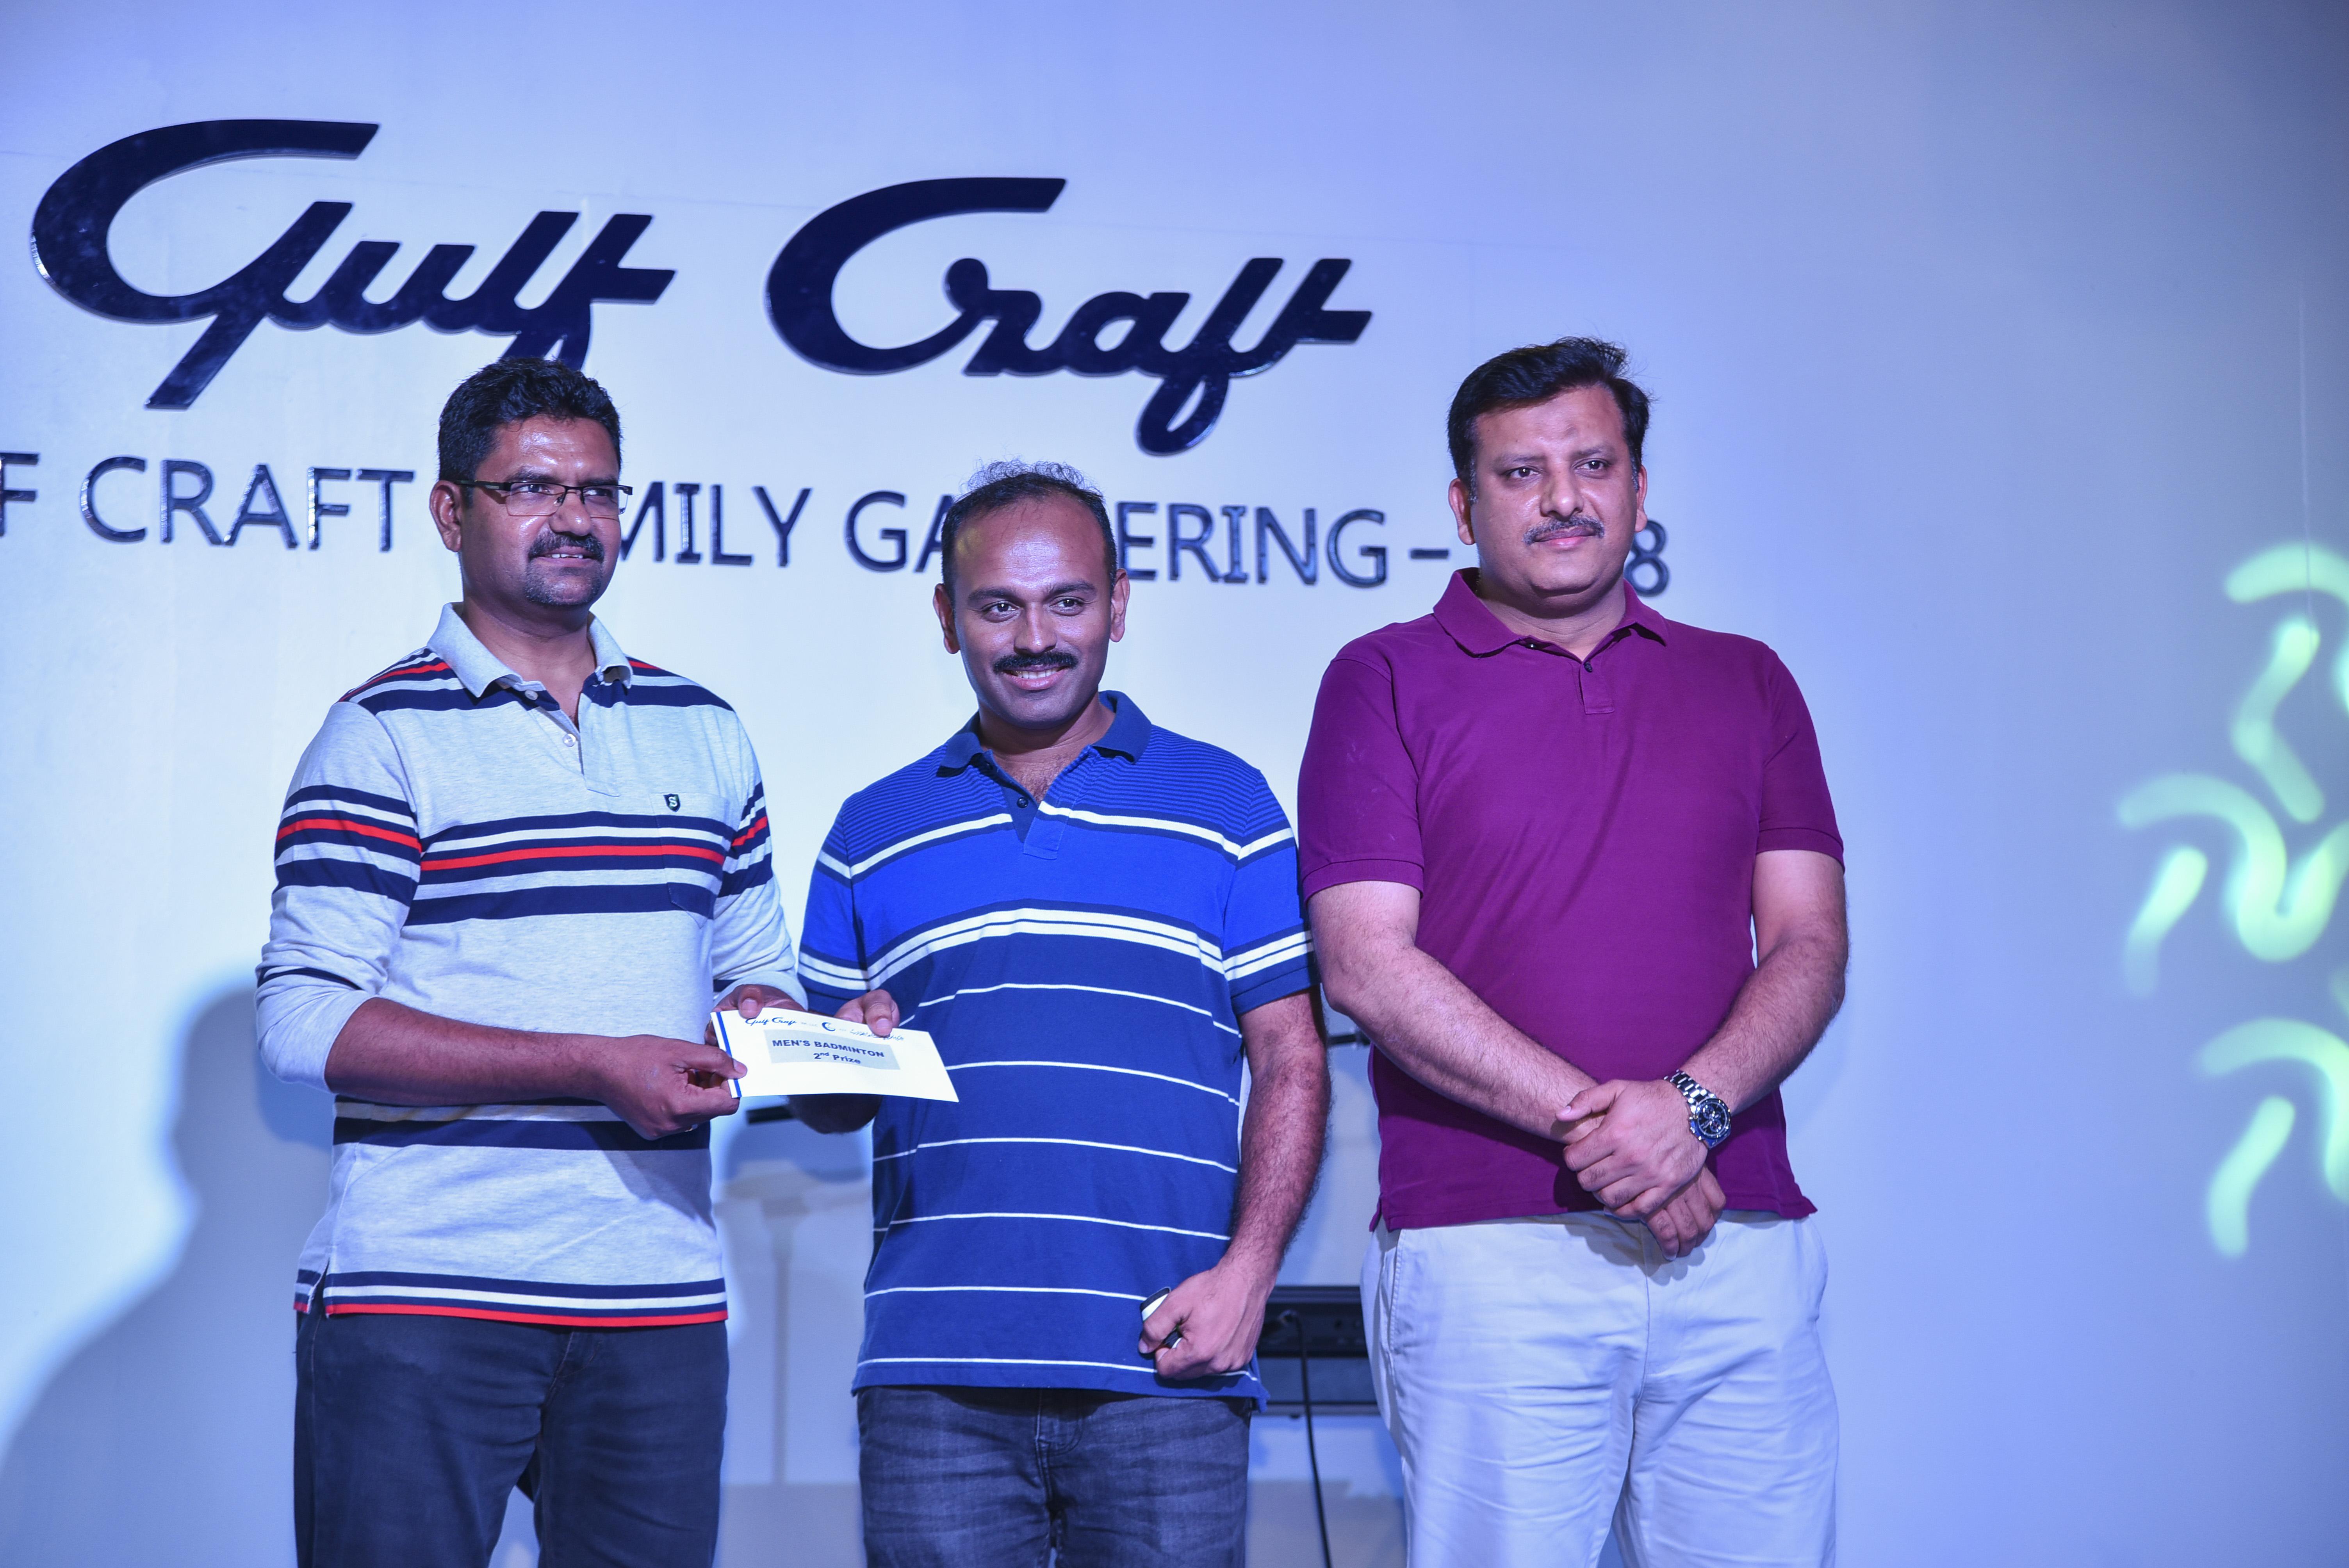 Gulf Craft's Annual Family Gathering 2018 (81).jpg